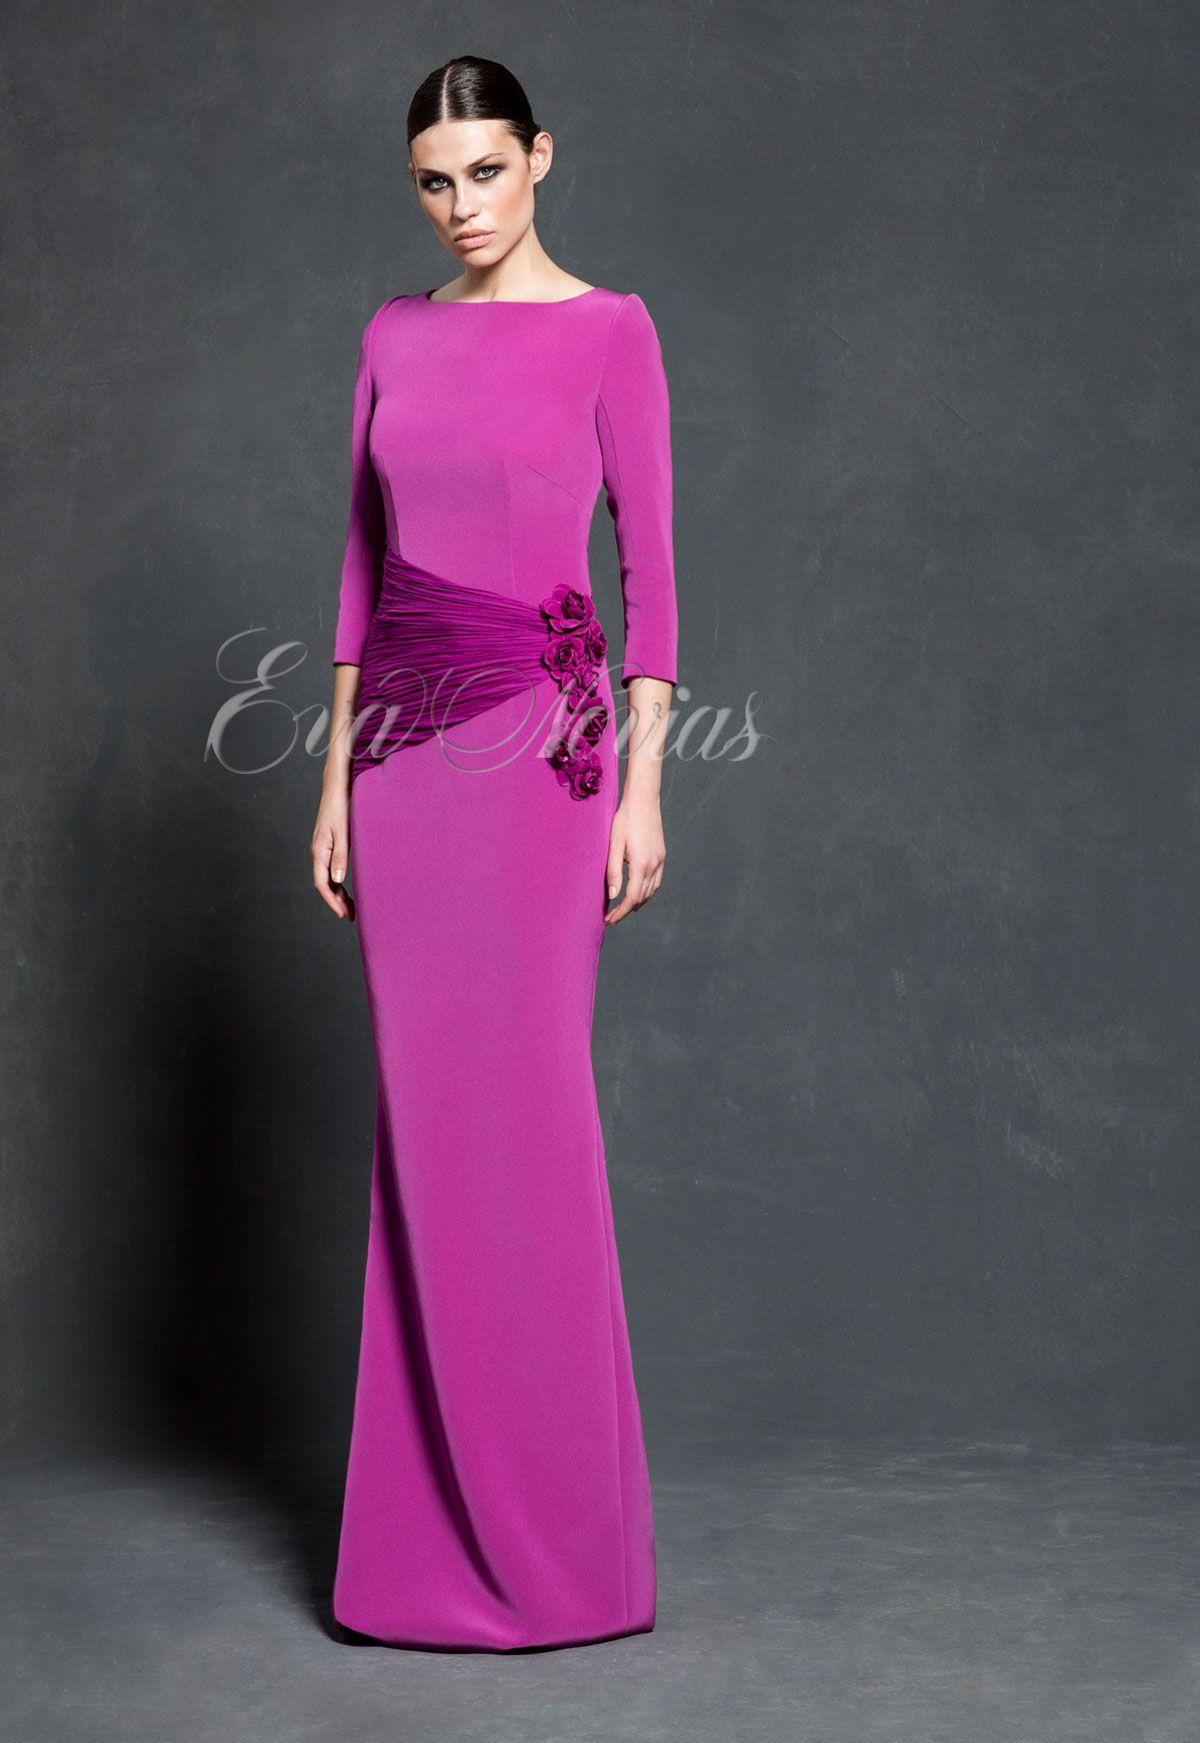 Vicky martin prom dress | ชุดราตรี | Pinterest | Vestidos de fiesta ...